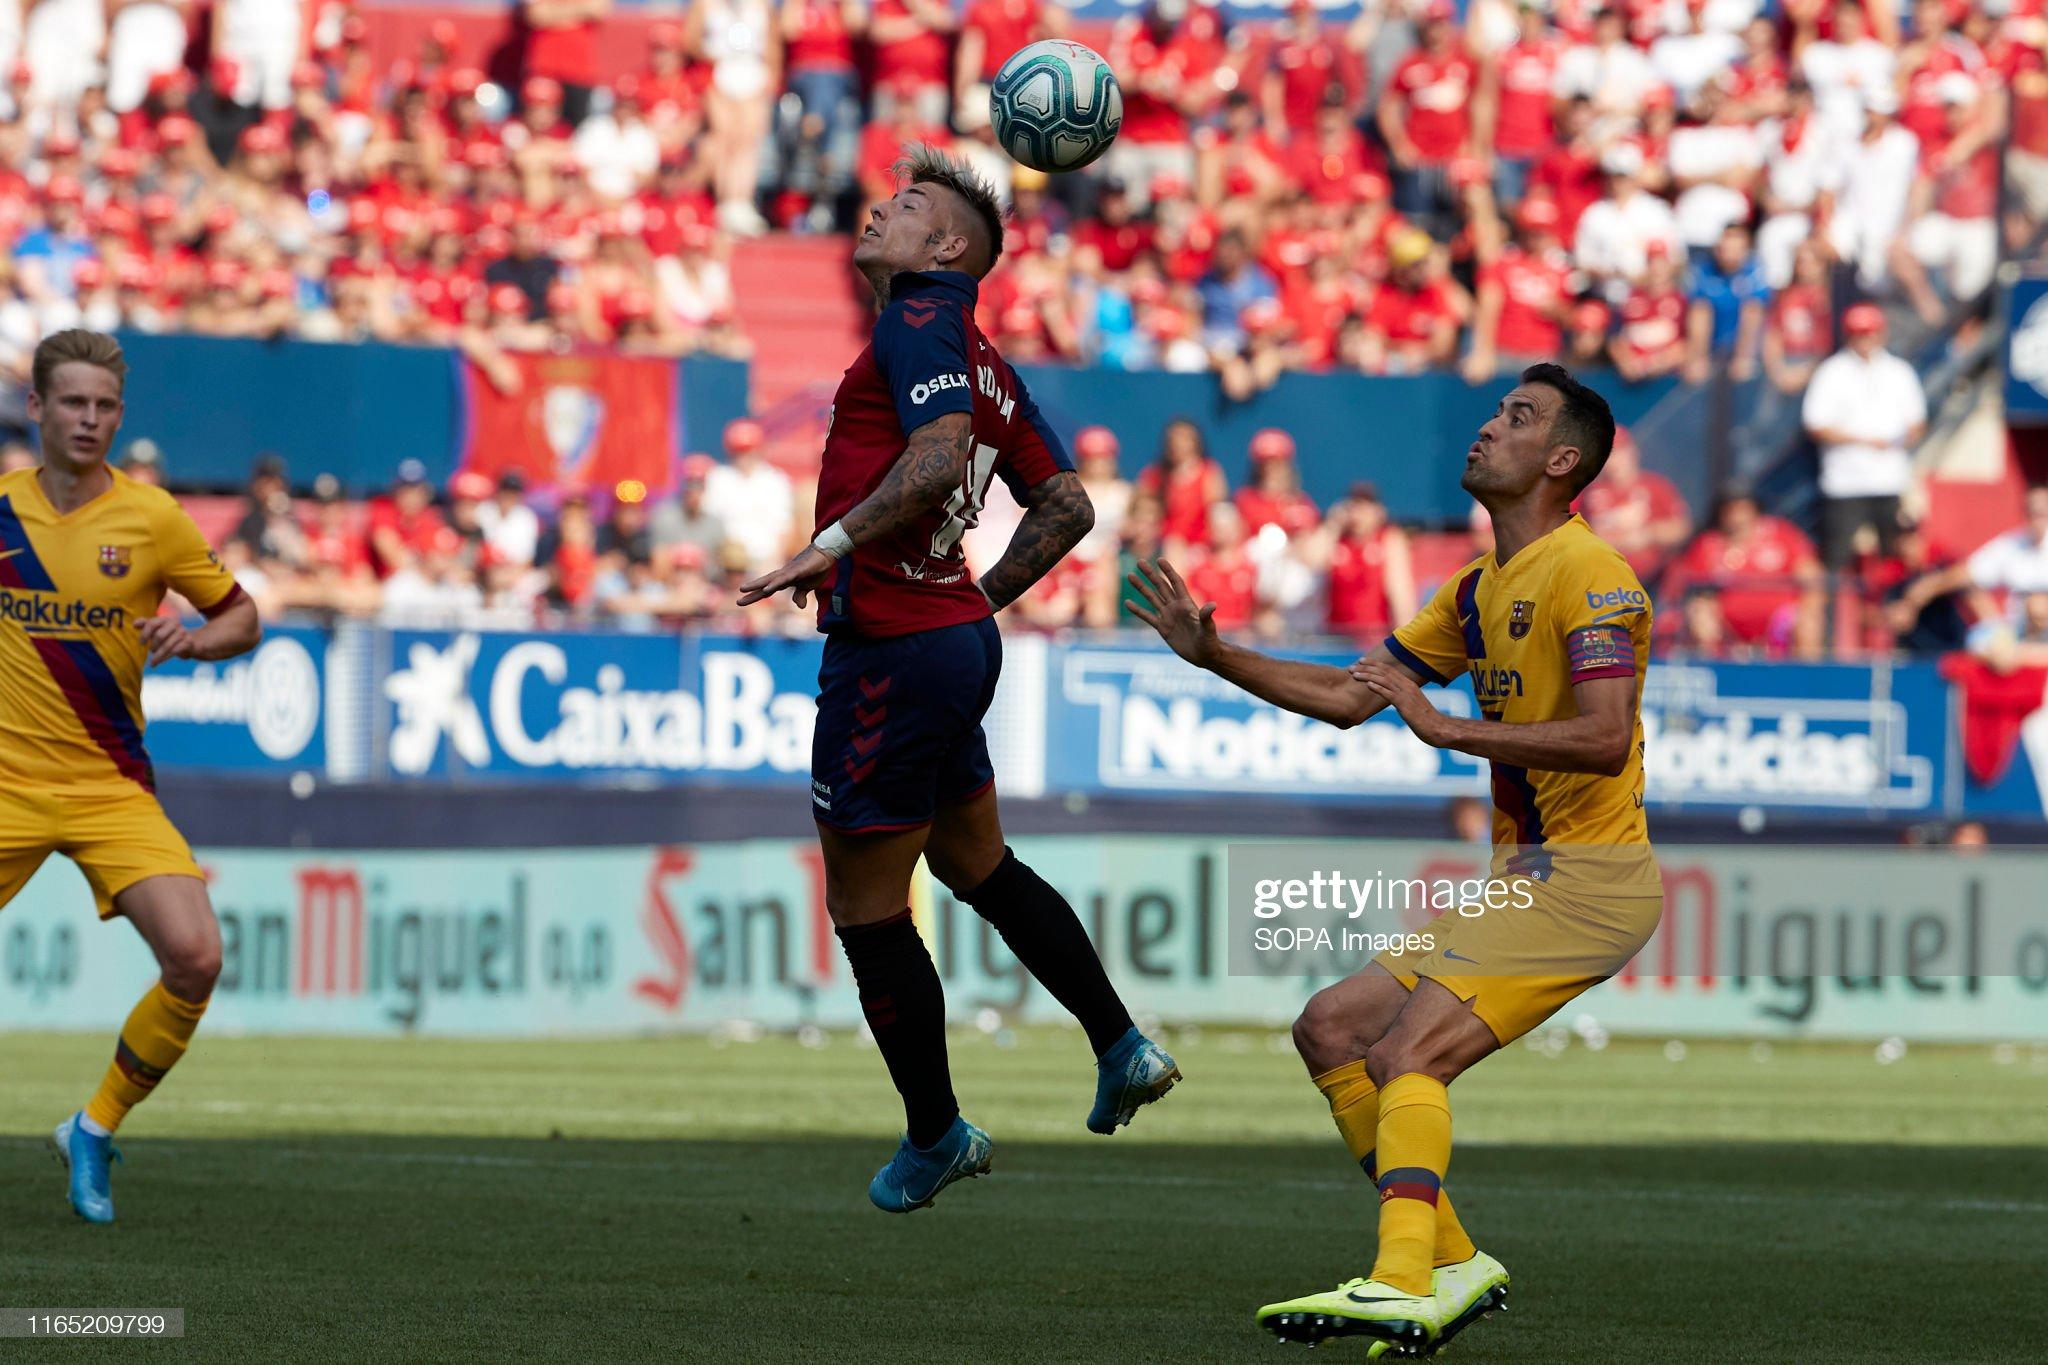 صور مباراة : أوساسونا - برشلونة 2-2 ( 31-08-2019 )  Brandon-thomas-llamas-and-sergio-busquets-in-action-during-the-la-picture-id1165209799?s=2048x2048